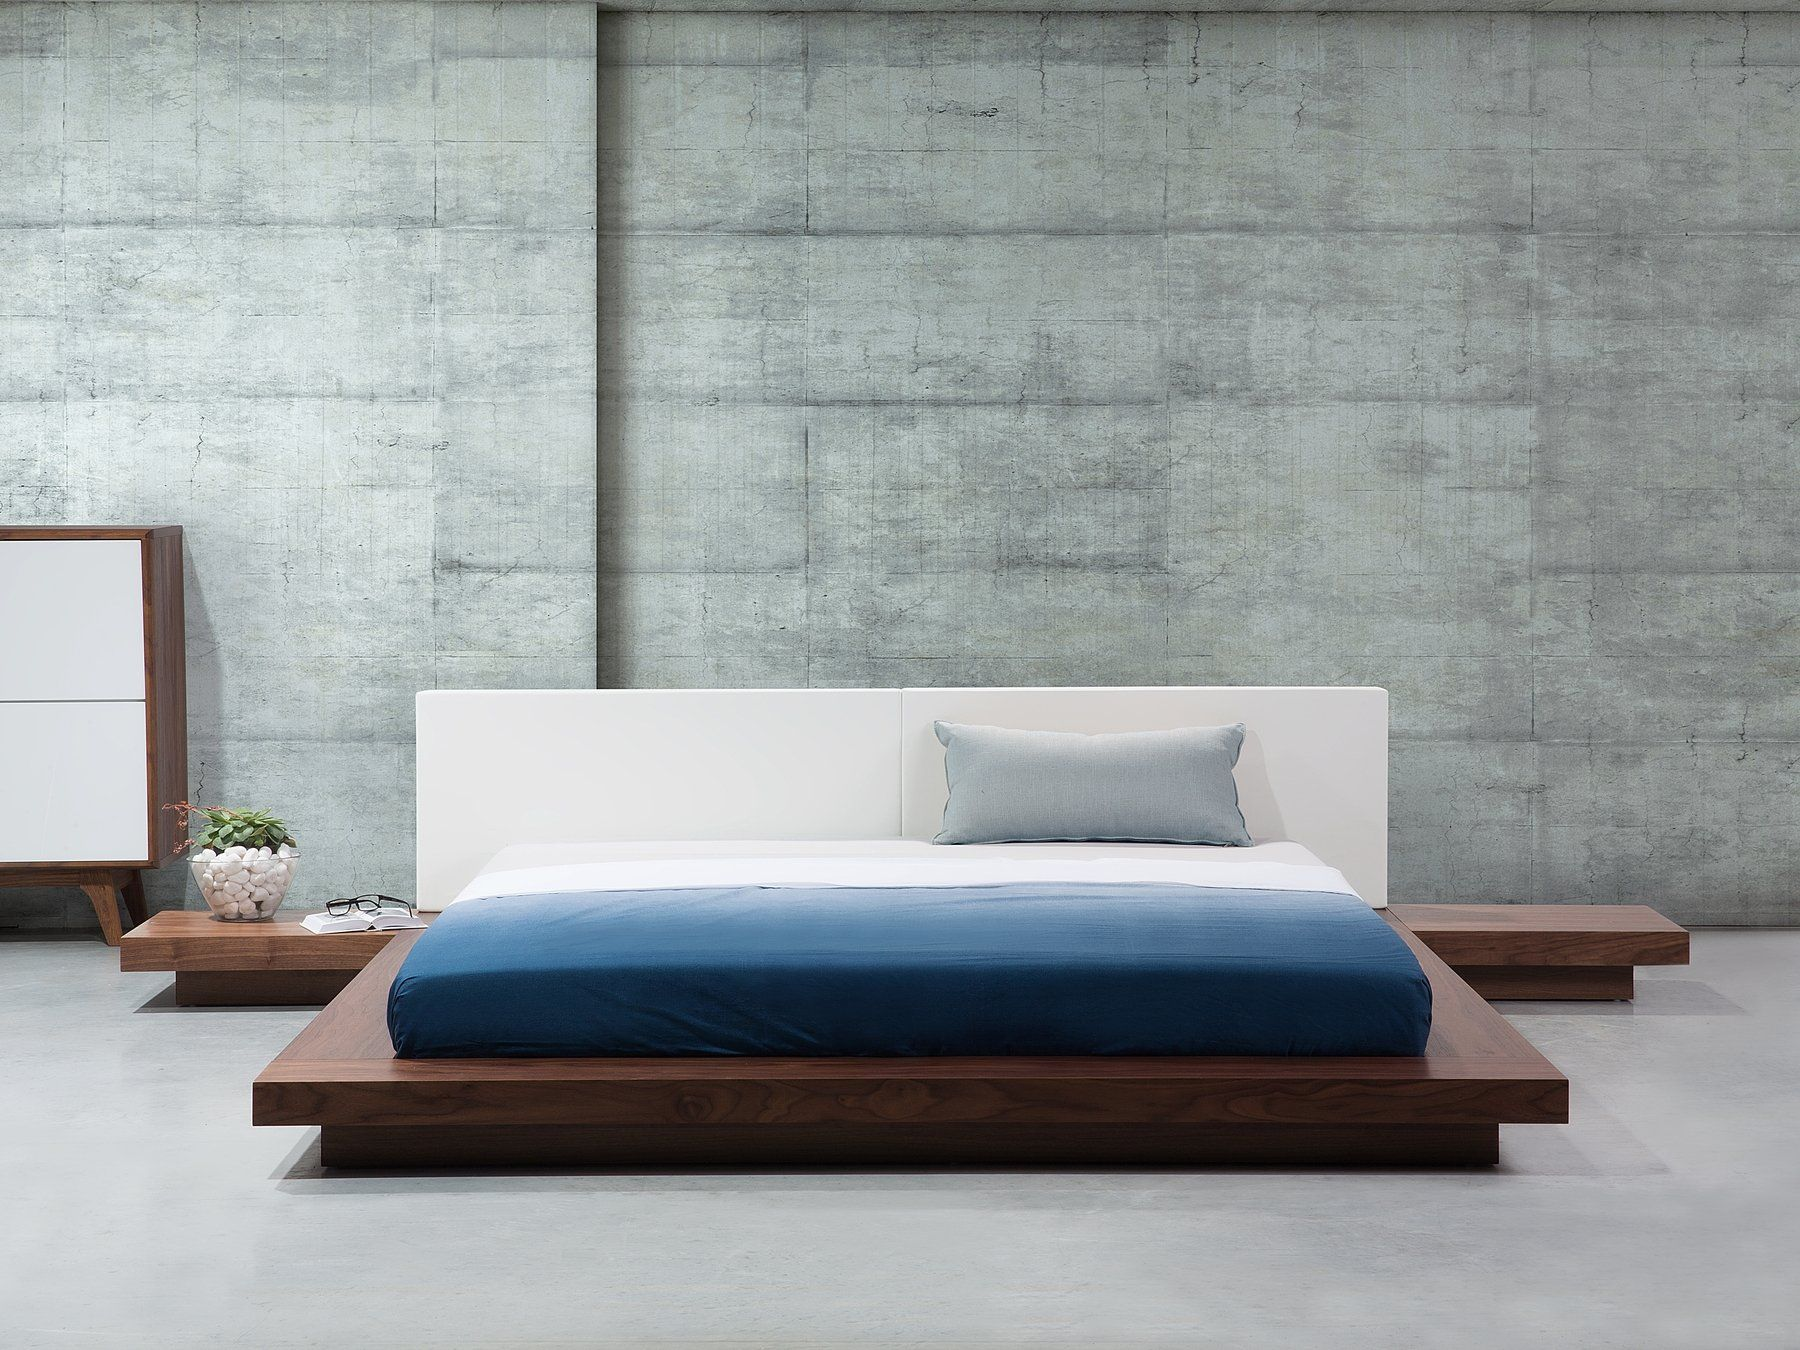 Wasserbett Holzfarbton 180 X 200 Cm Zen Holzbetten Bett Modern Designer Bett